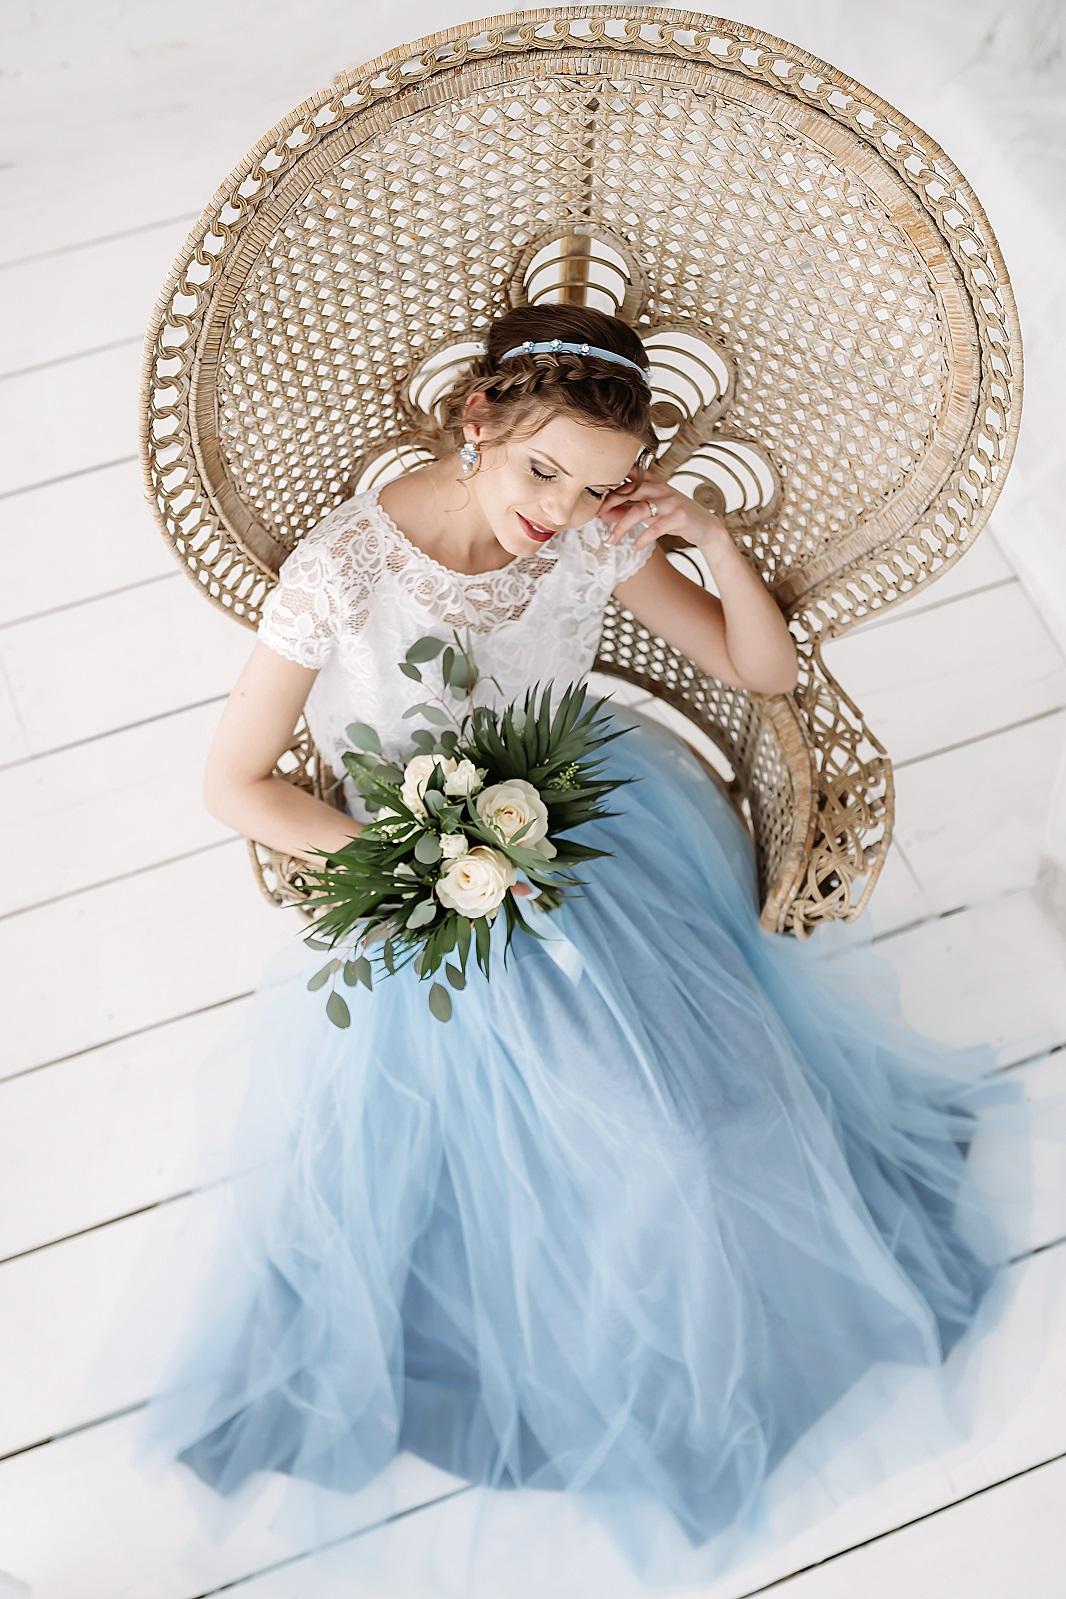 melyna vestuvine suknele